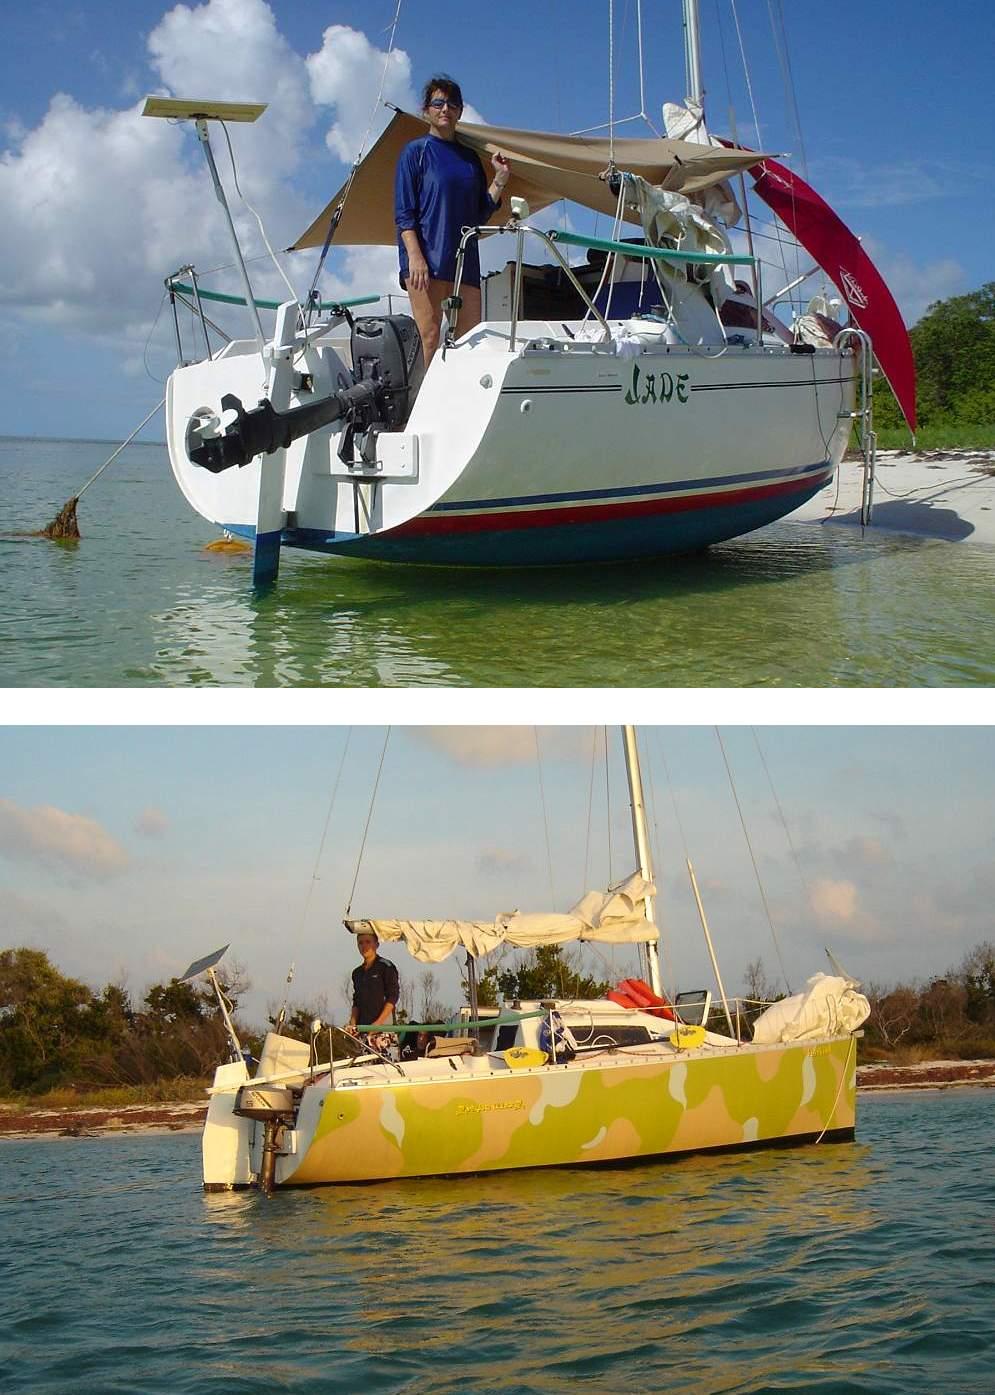 Myrtle Beach Craigslist Used Boats